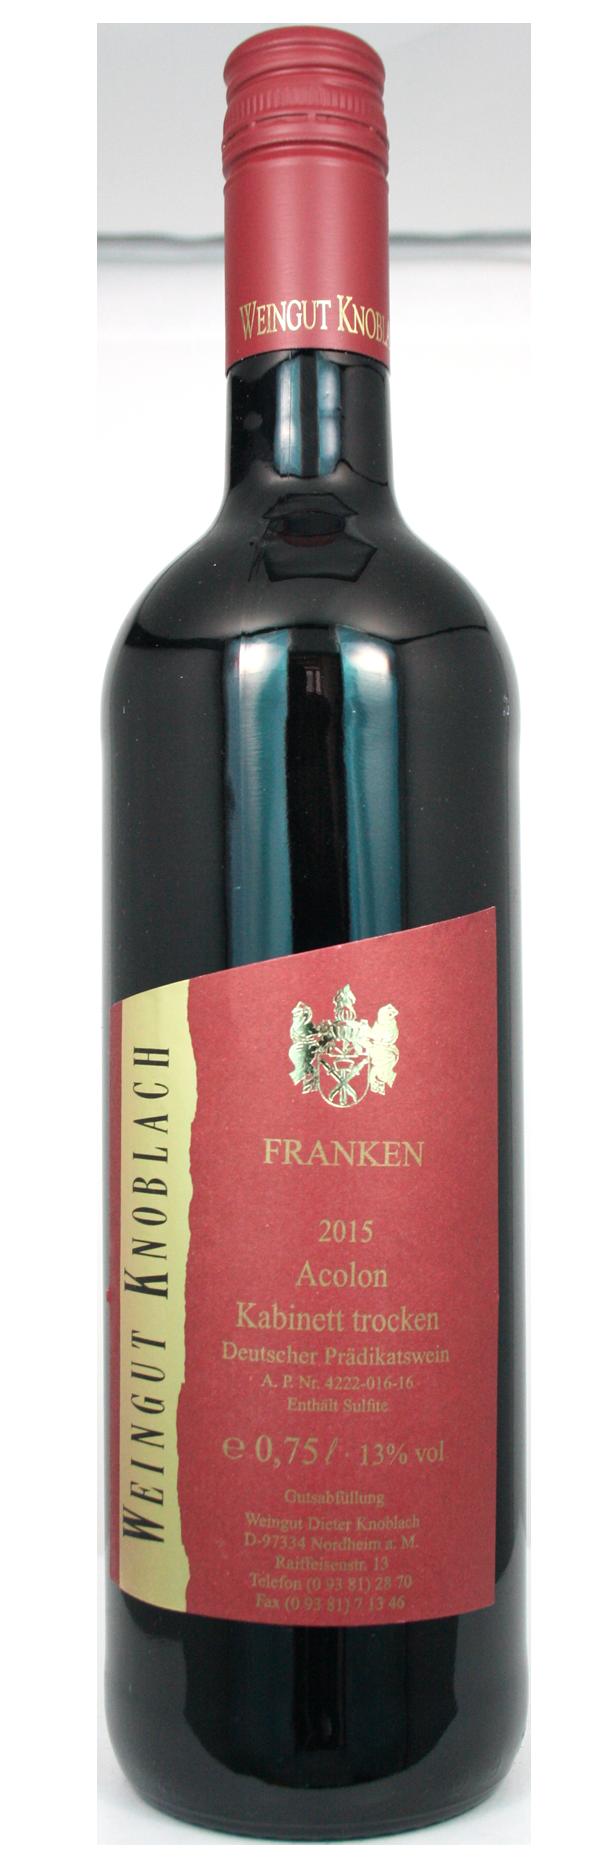 2015-acolon-kabinett-trocken-bxflasche